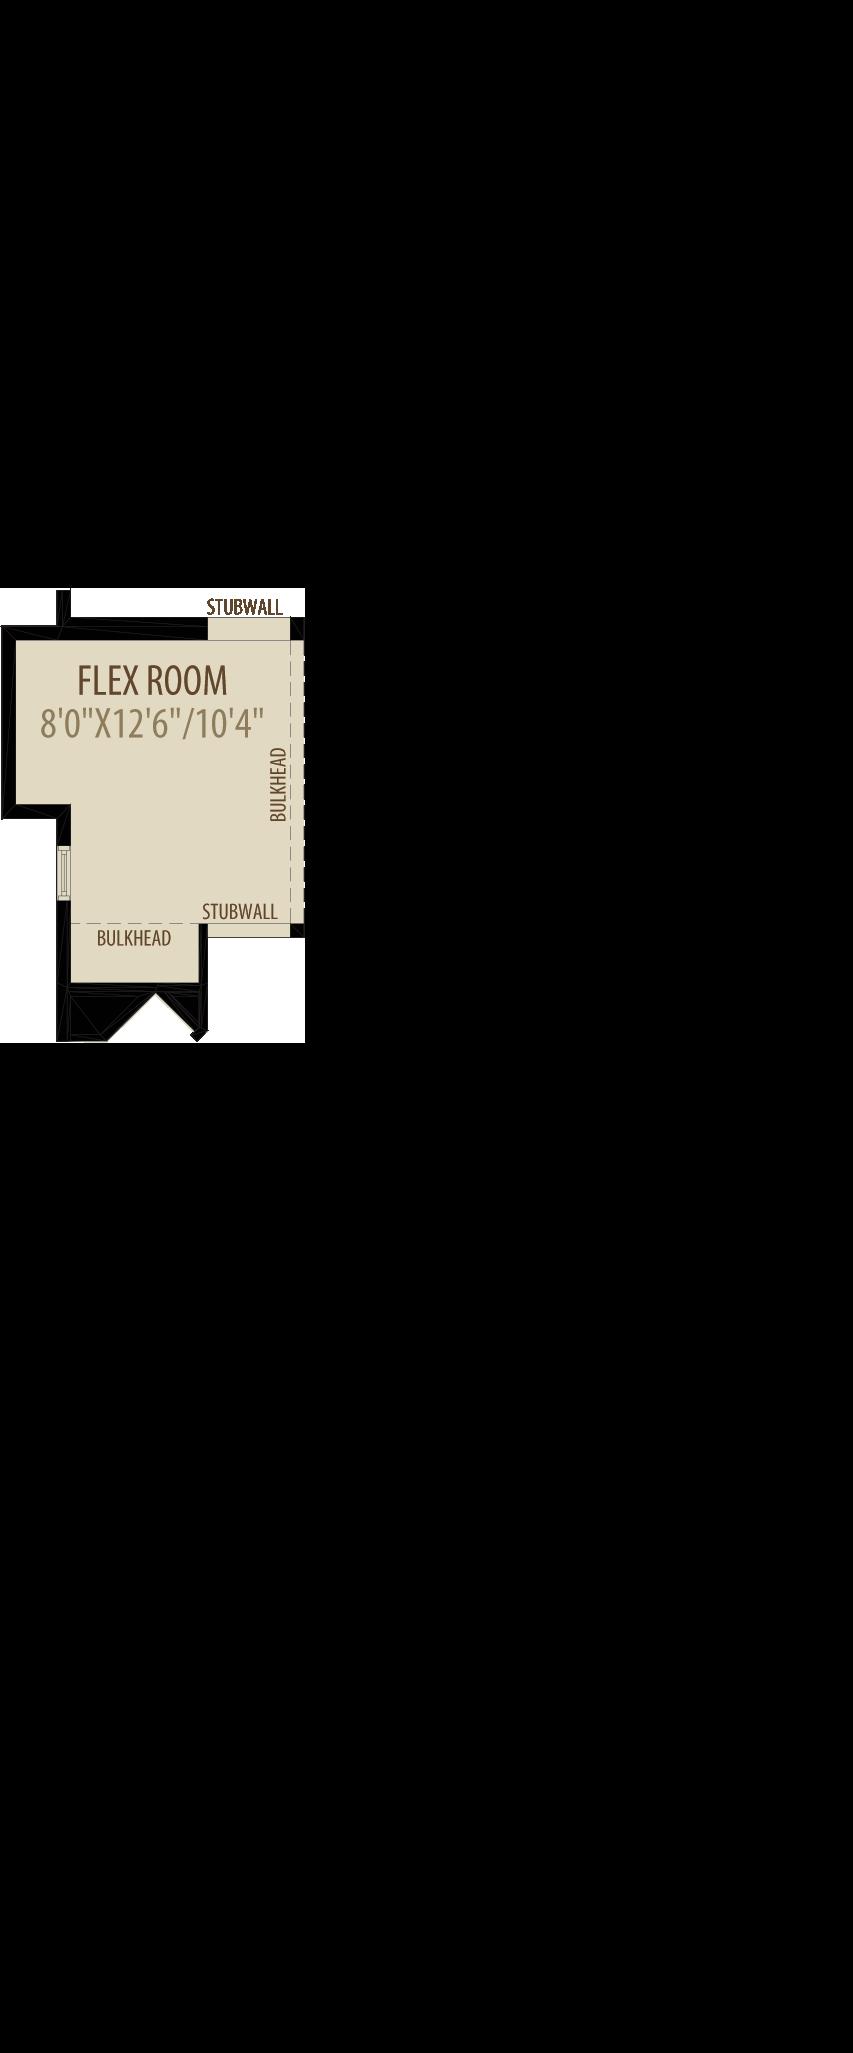 Flex Room Cantilever adds 14 sq ft